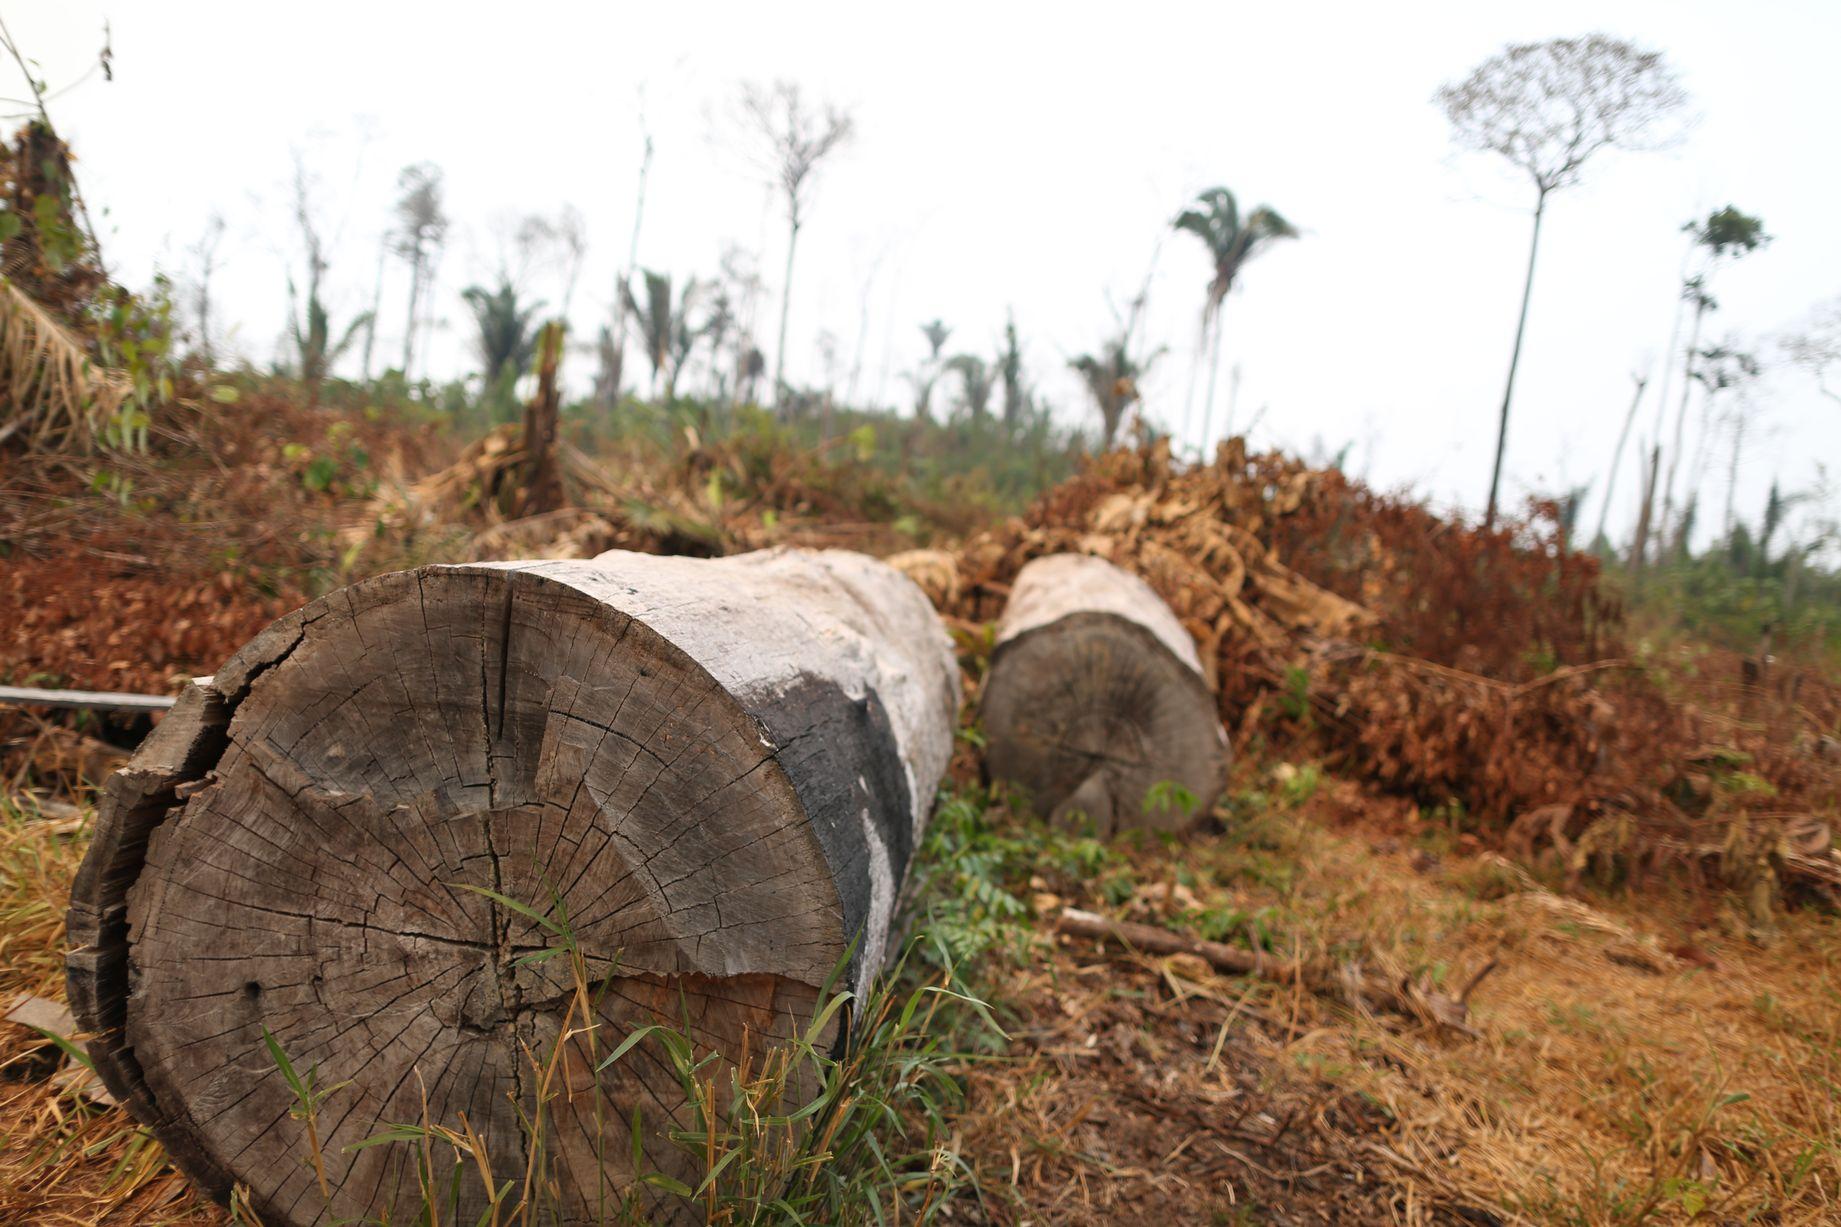 0_AmazonFires_PortoVelho_RO__24082019_c_WWF-Brasil_010JPG